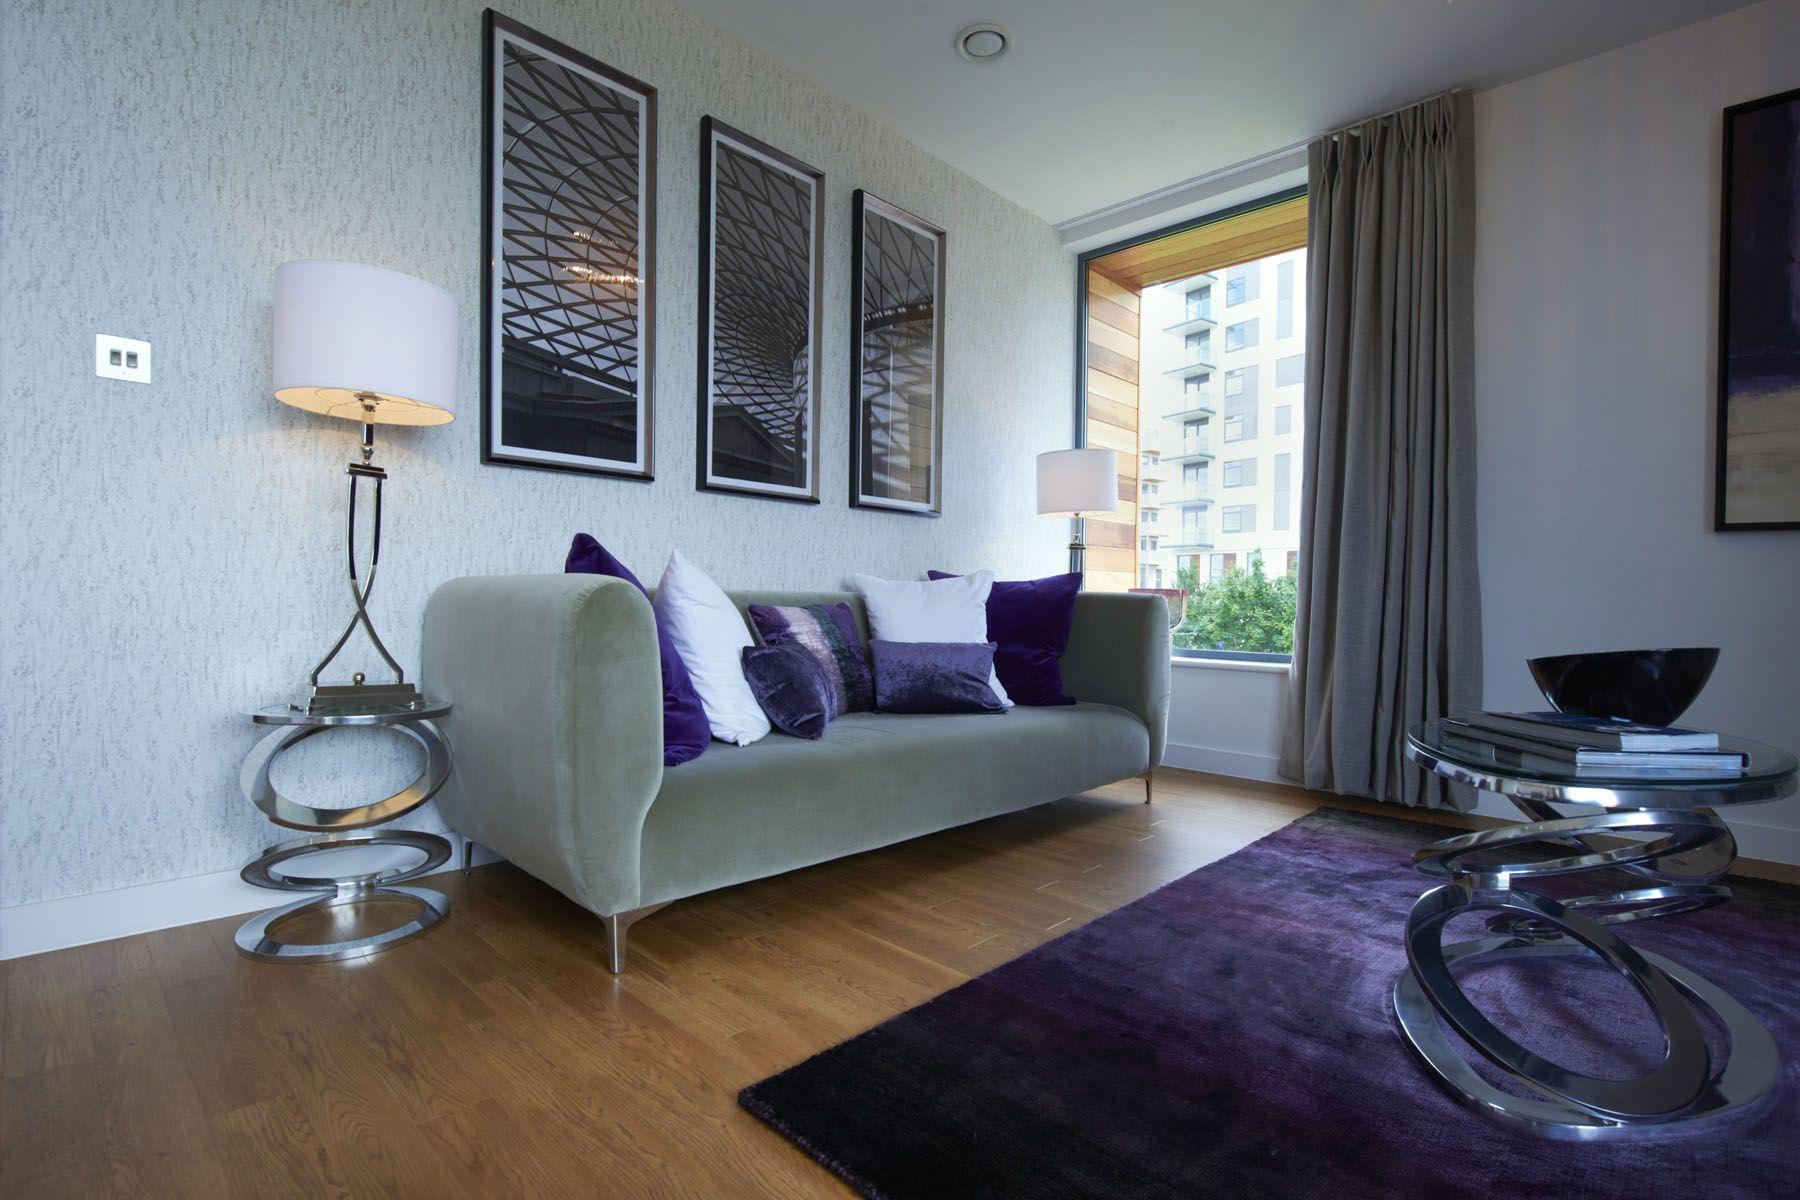 2 bedroom interior design  bed apt living room   ideas for the house  pinterest  interior